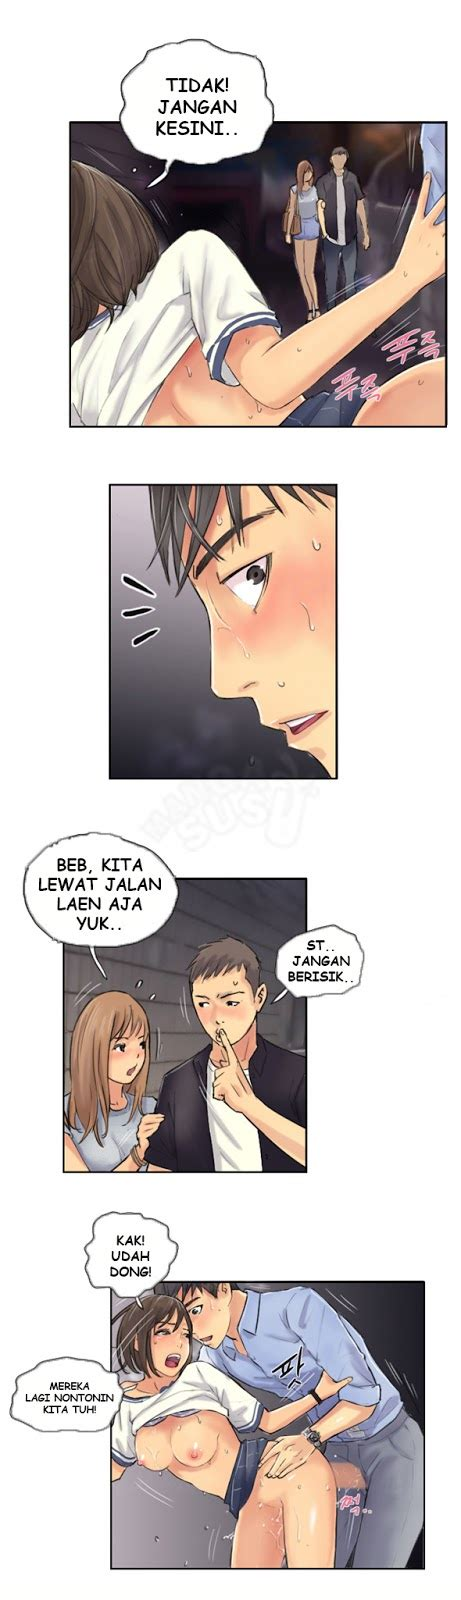 Kepergok Mesum Sama Pasangan Lain Gudang Komik Manga